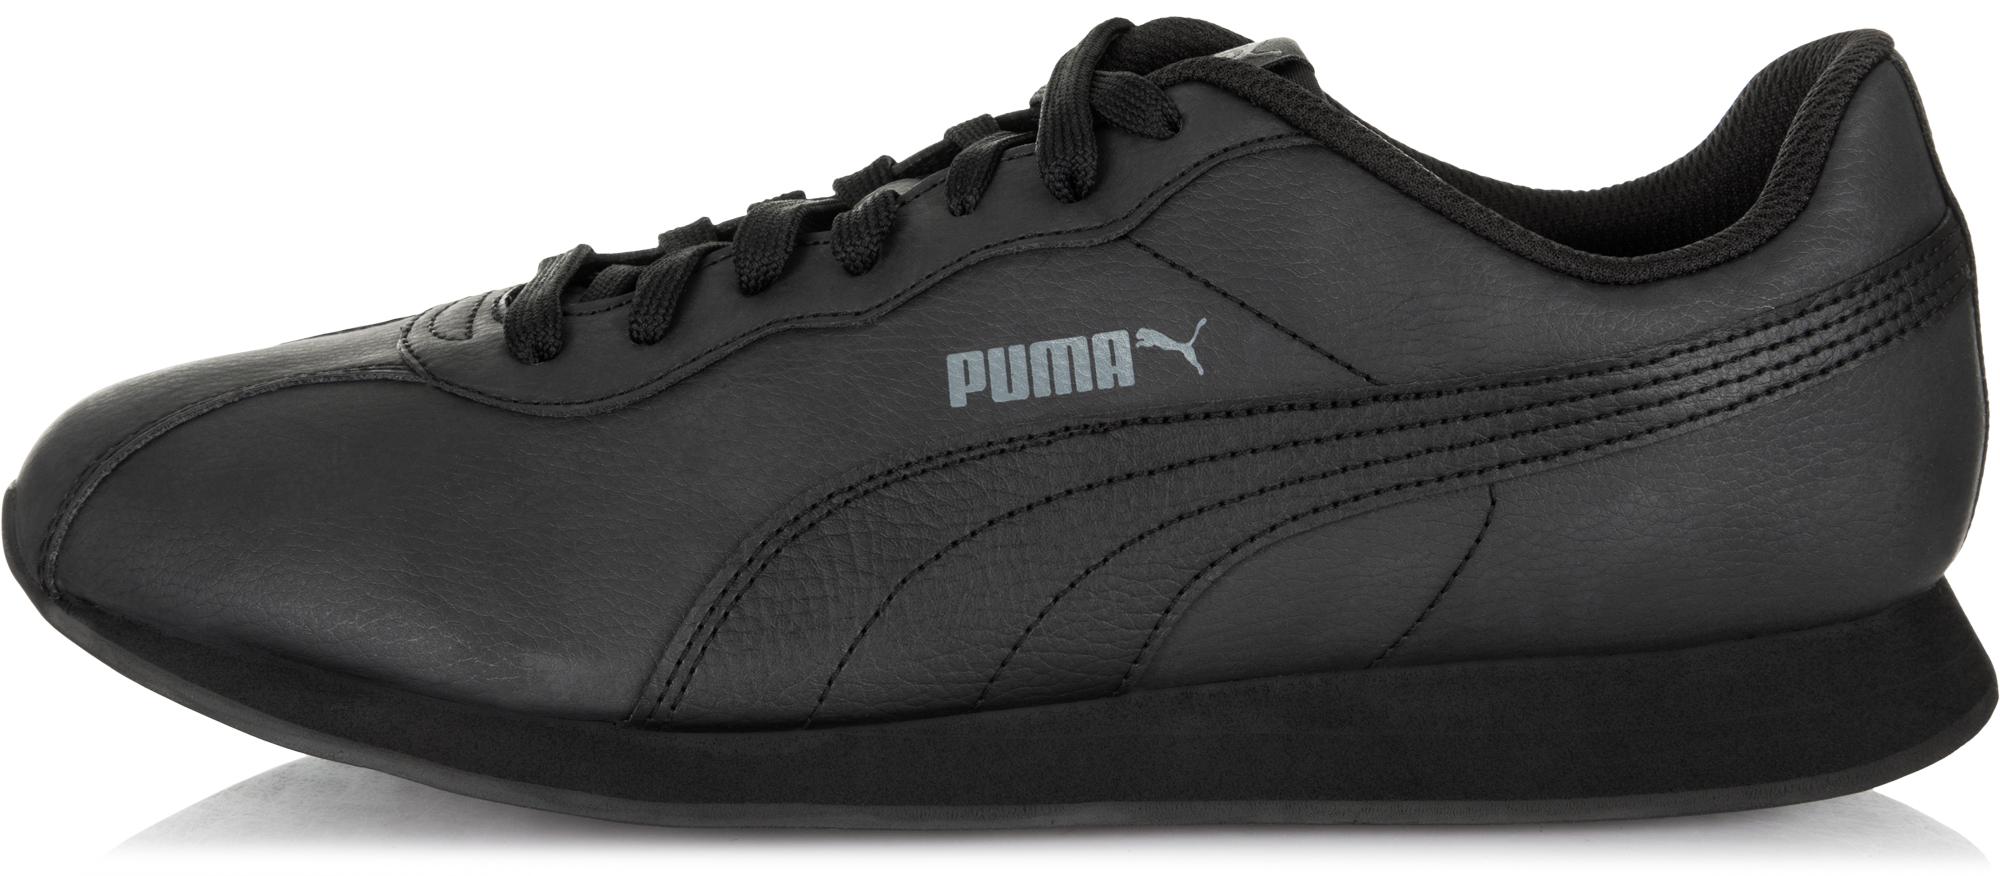 Puma Кроссовки мужские  Turin II, размер 43